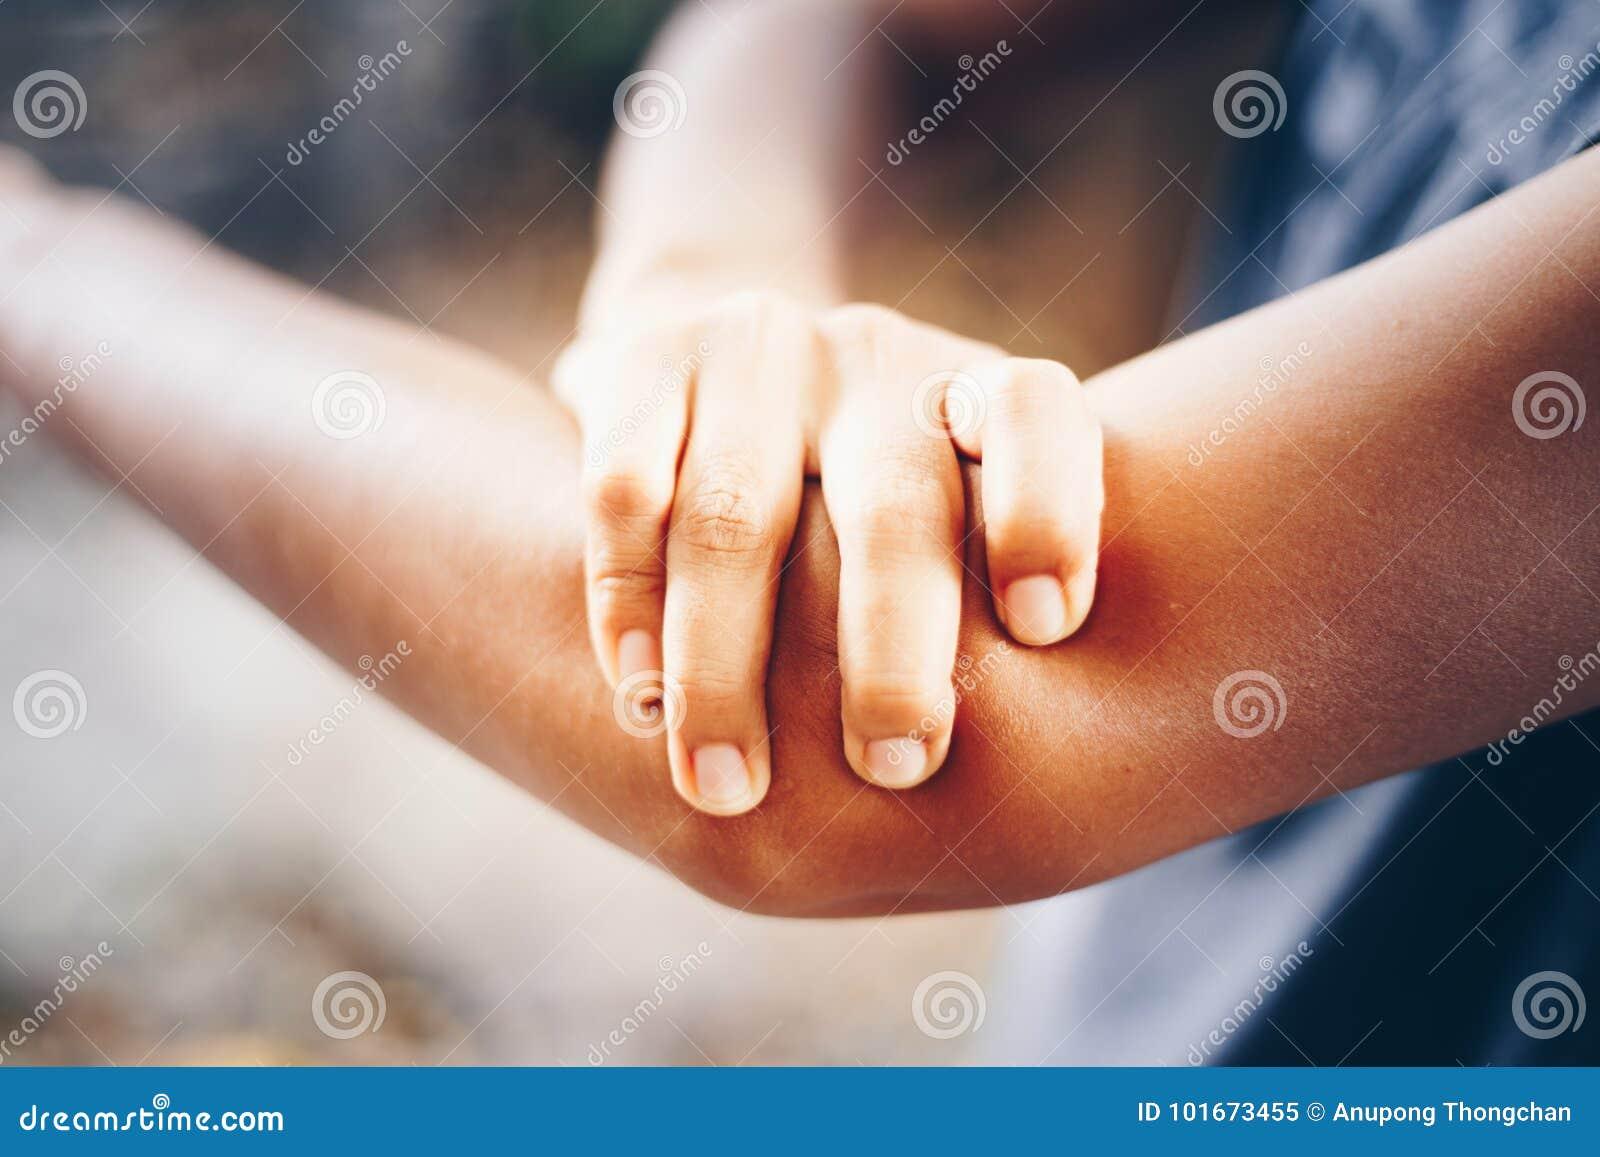 Female having pain in injured arm.